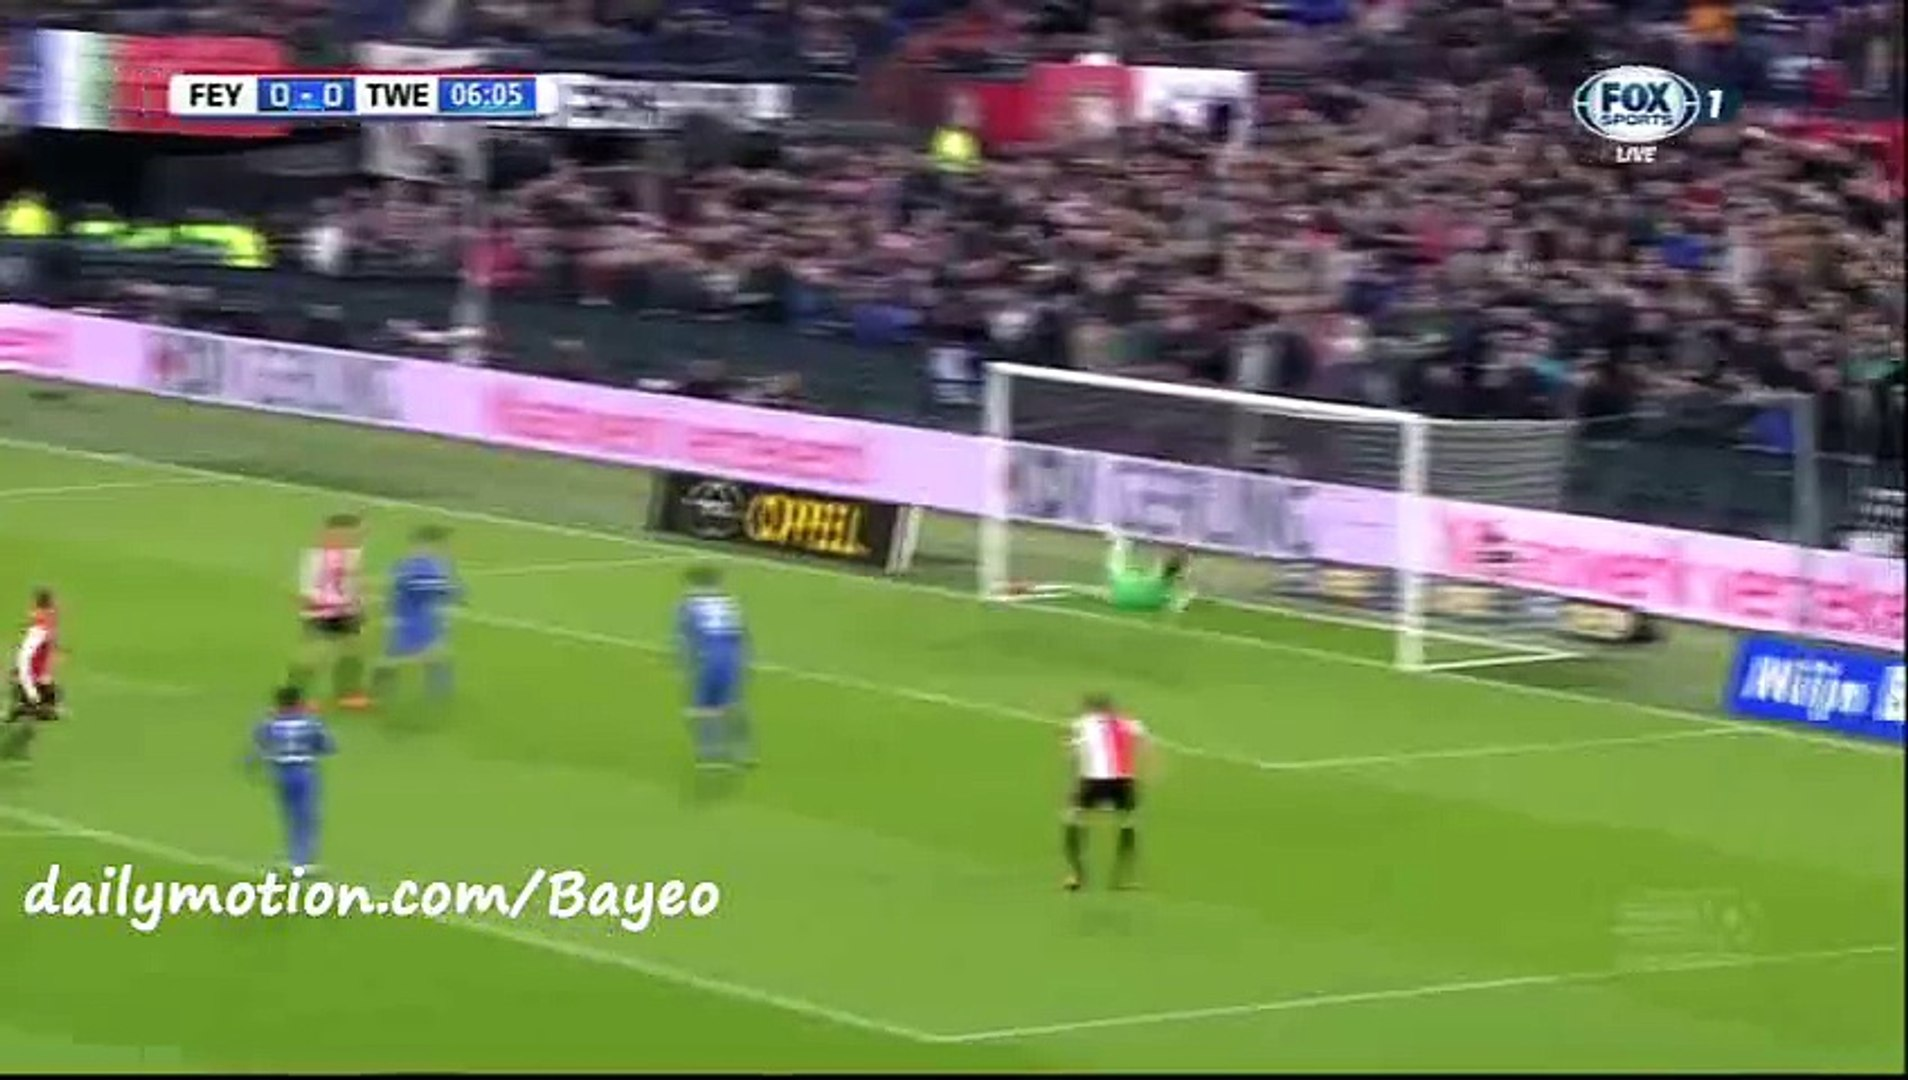 Gustafsson Goal - Feyenoord 1-0 Twente - 22-11-2015 Eredivisie